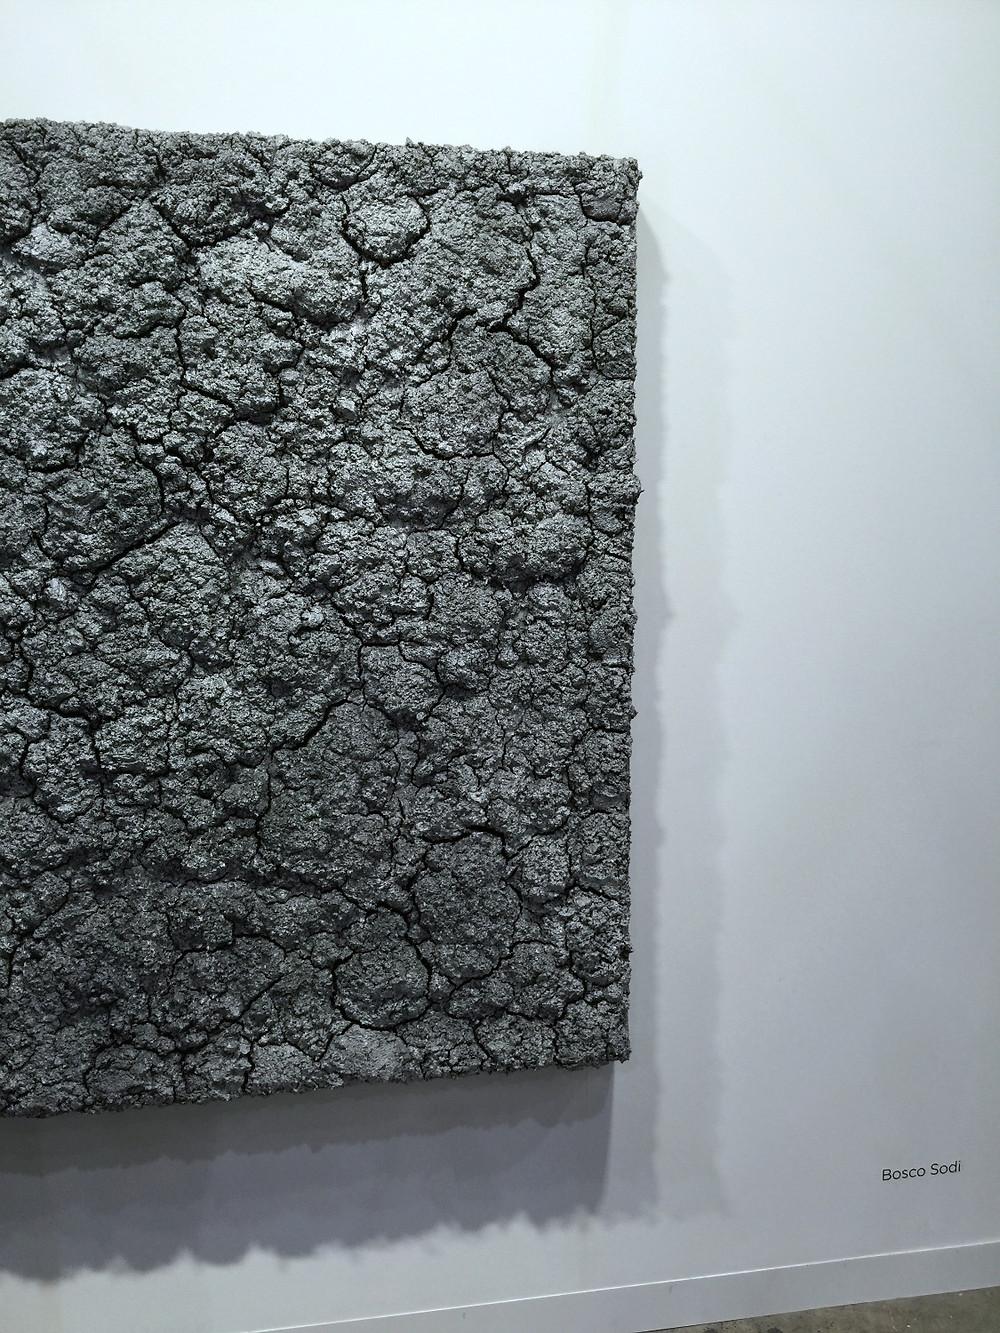 Bosco Sodi | Art Basel HK 2016